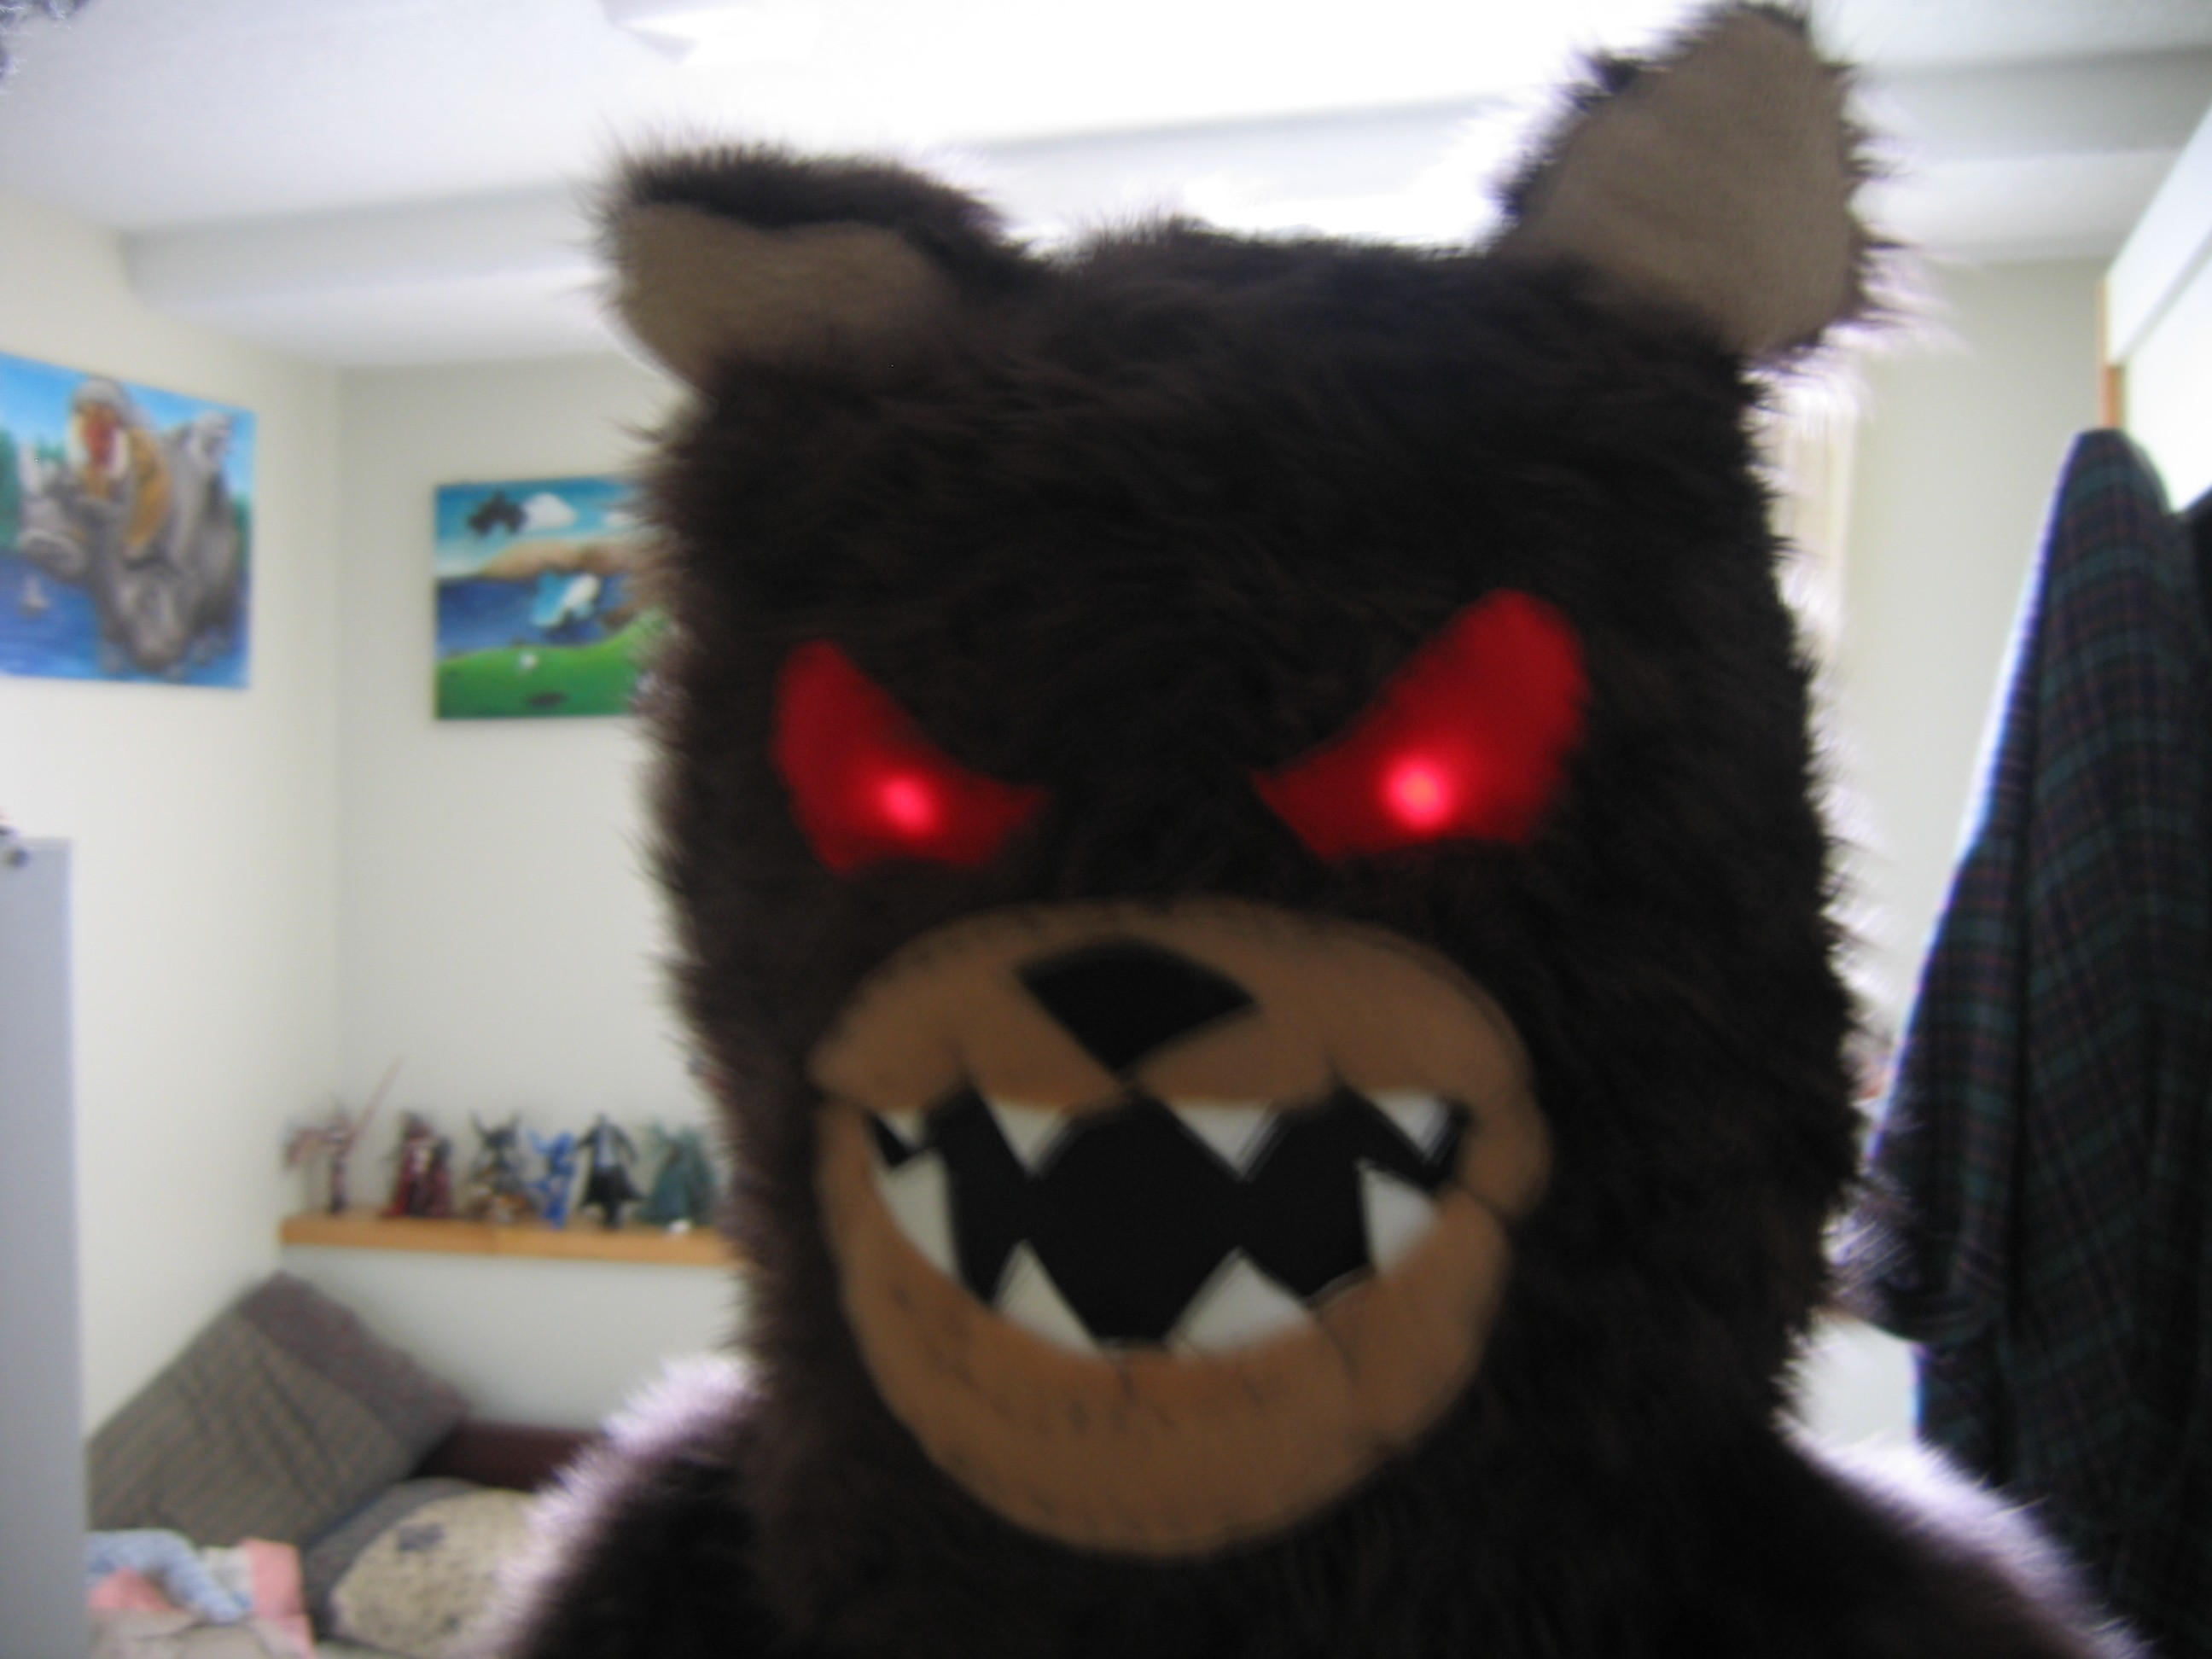 ... Evil Teddy Bear Costume 1 by wizardofosmond & Evil Teddy Bear Costume 1 by wizardofosmond on DeviantArt